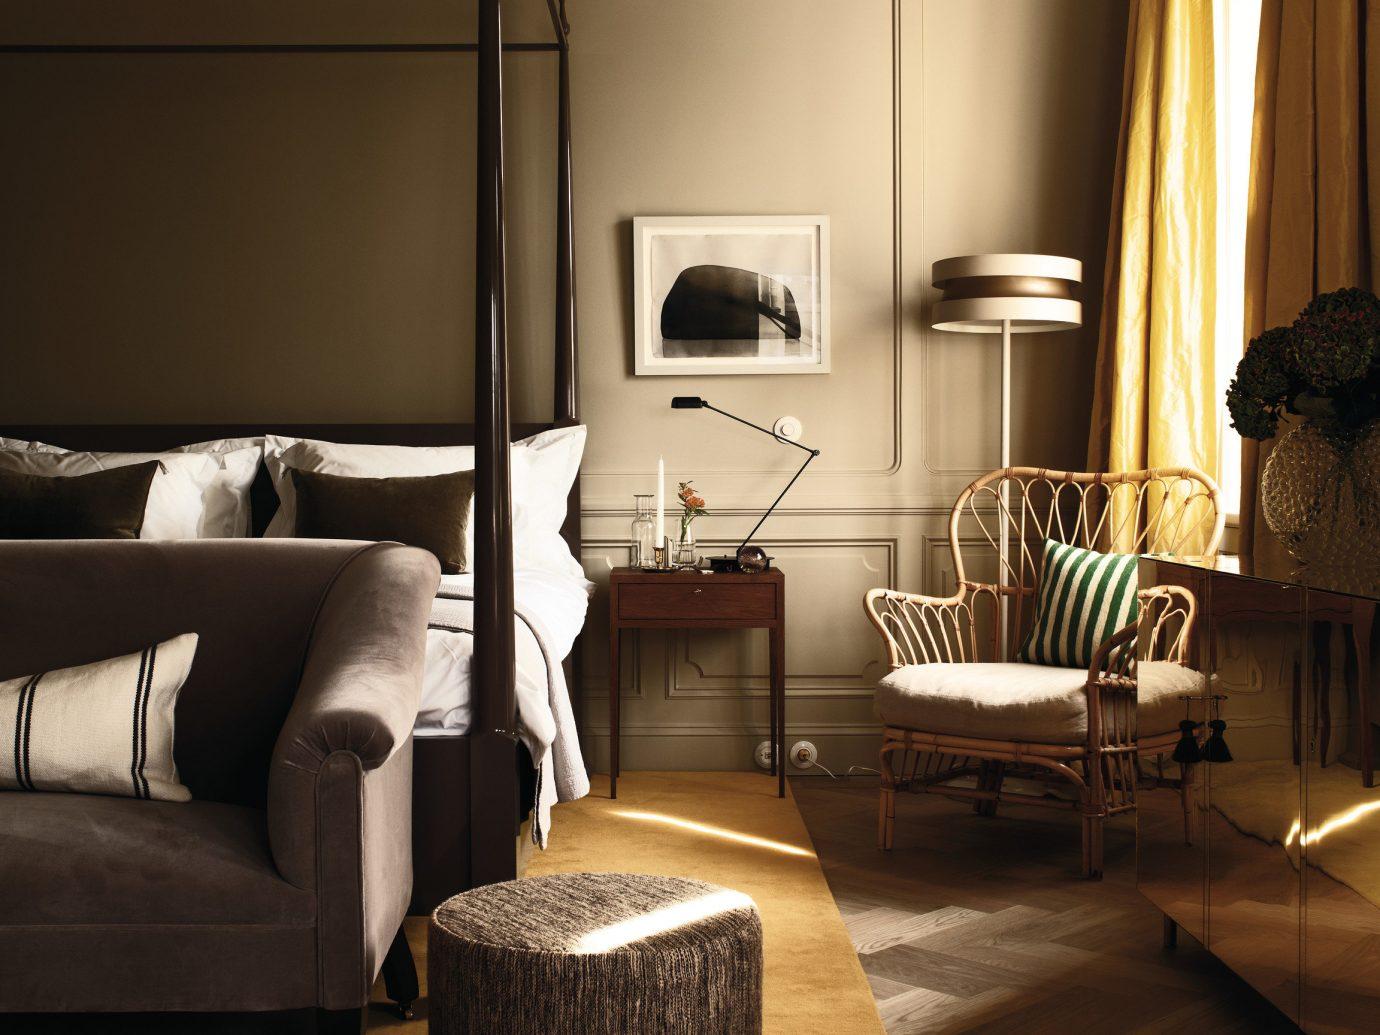 Design Hotels indoor wall floor room living room furniture interior design Living table window flooring home interior designer ceiling